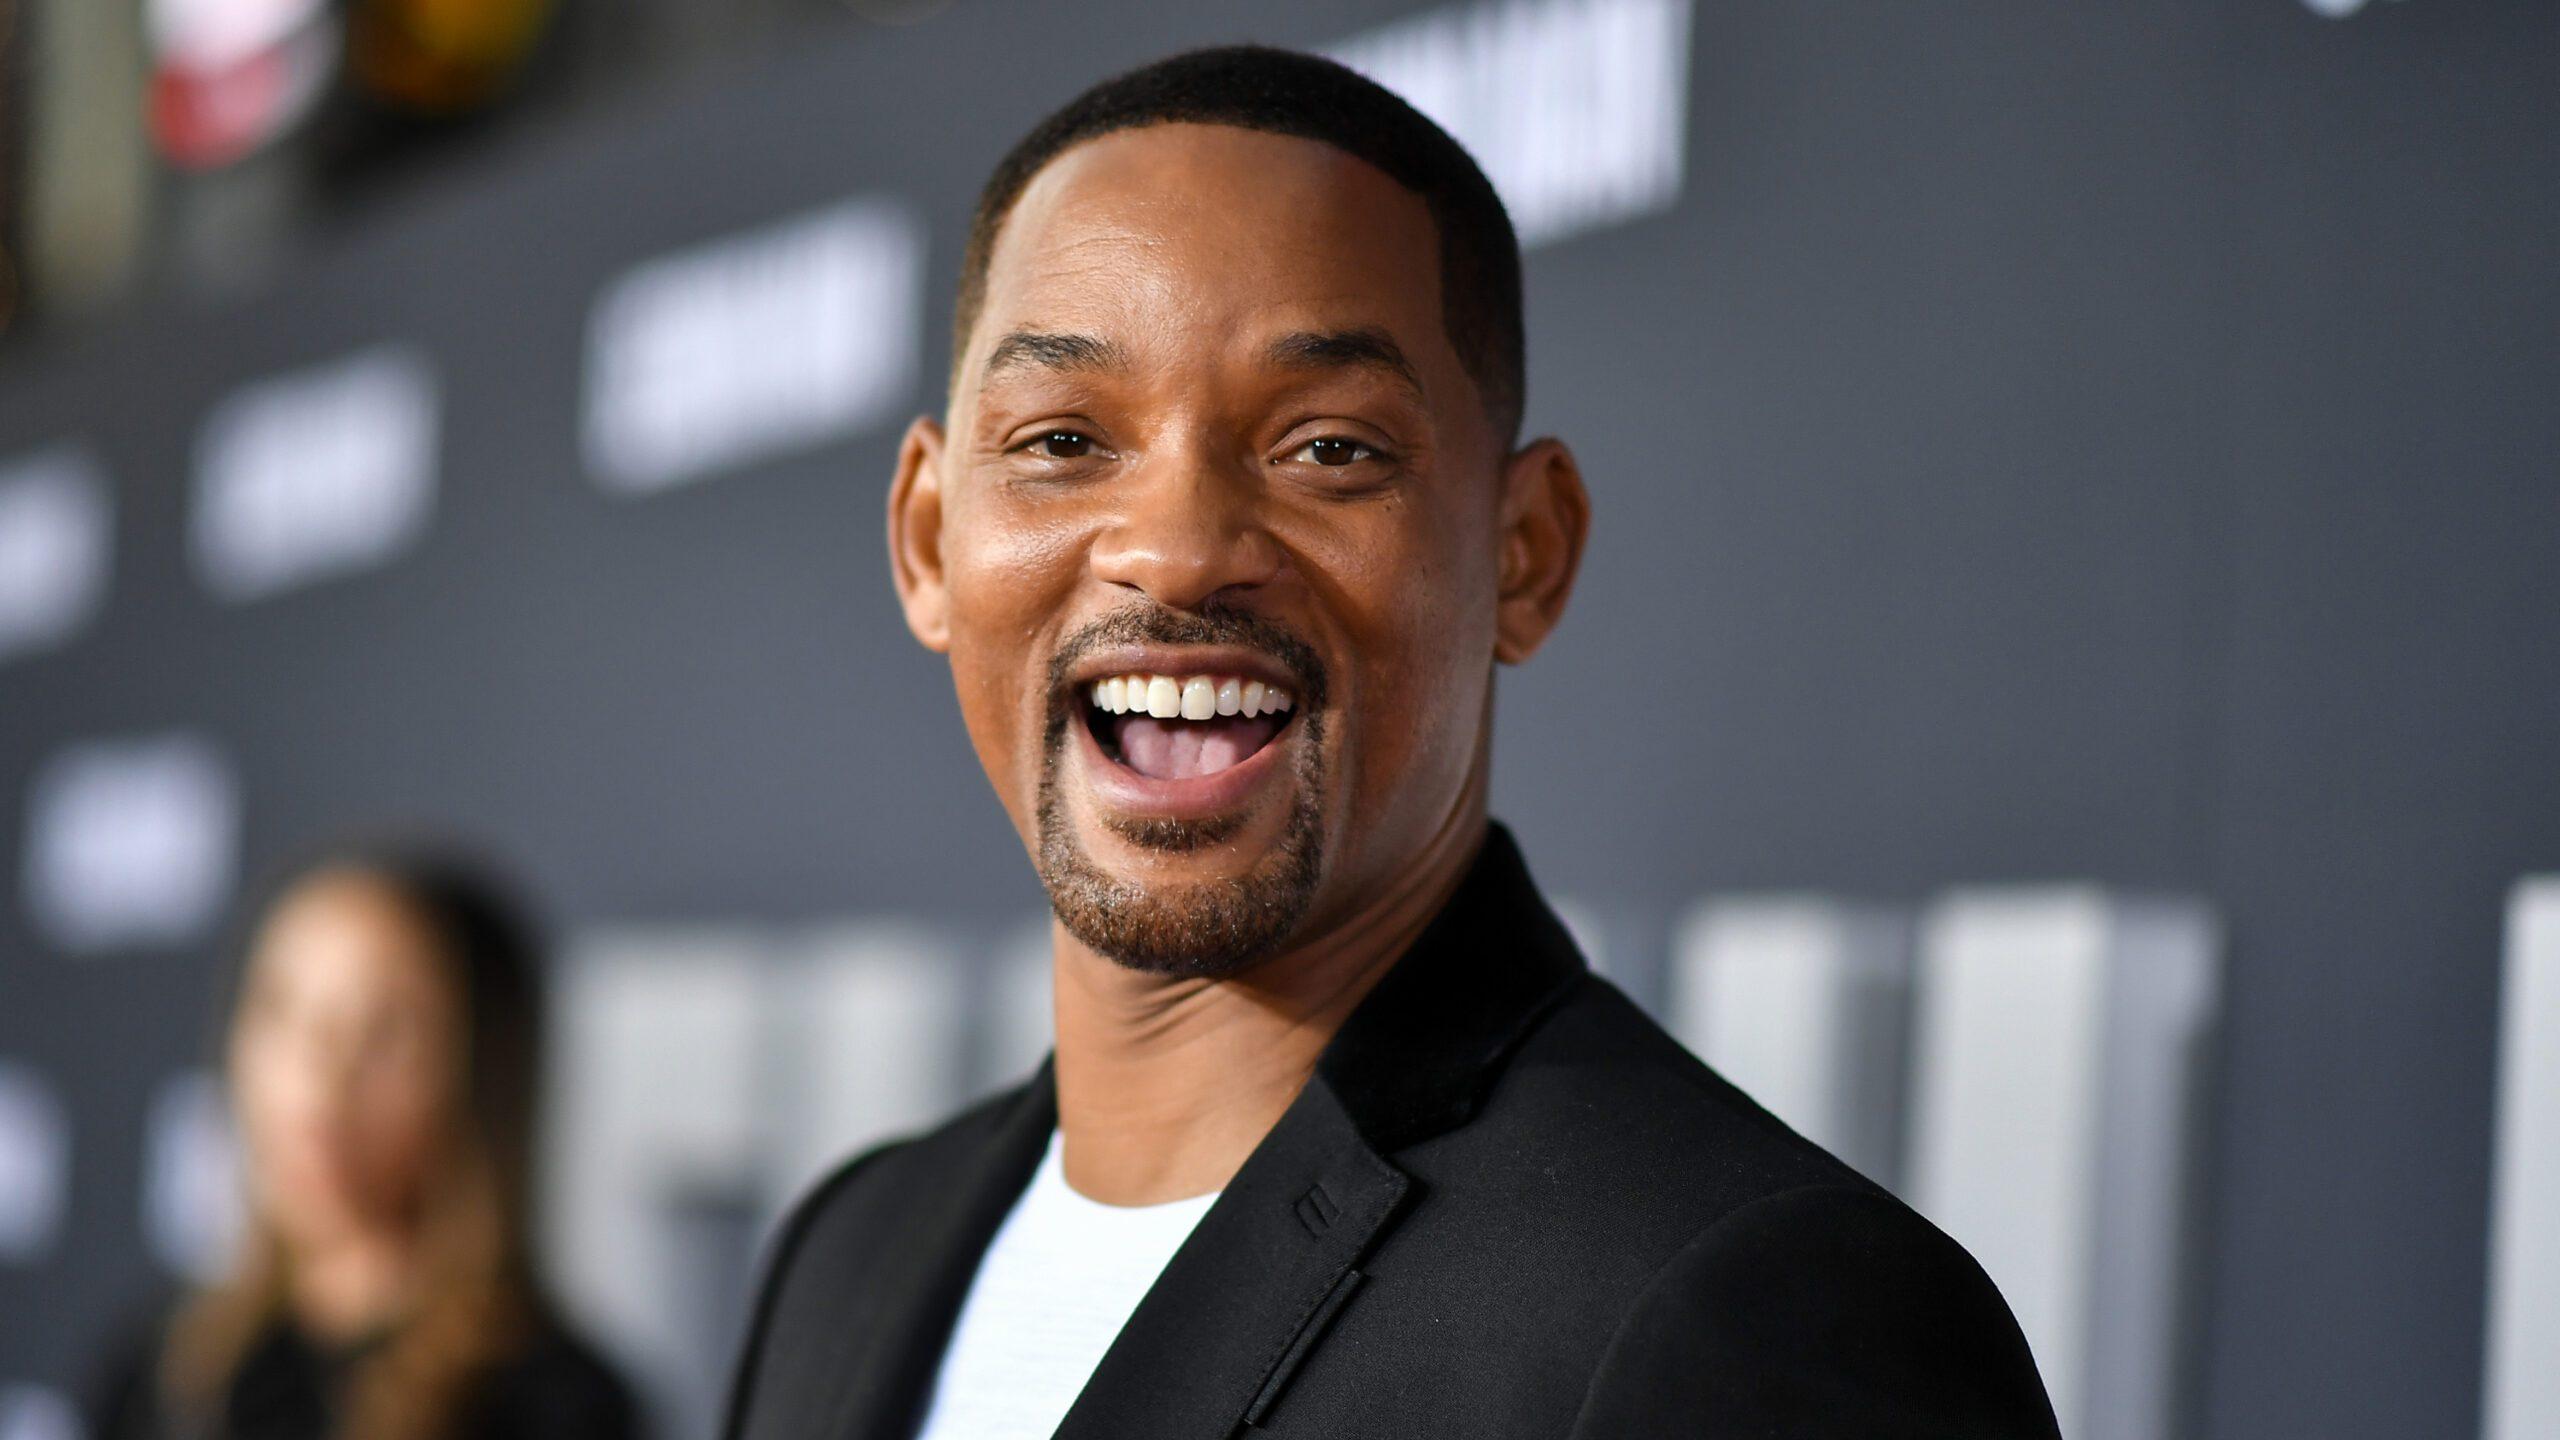 Will Smith 10 most popular TikTok stars in the world